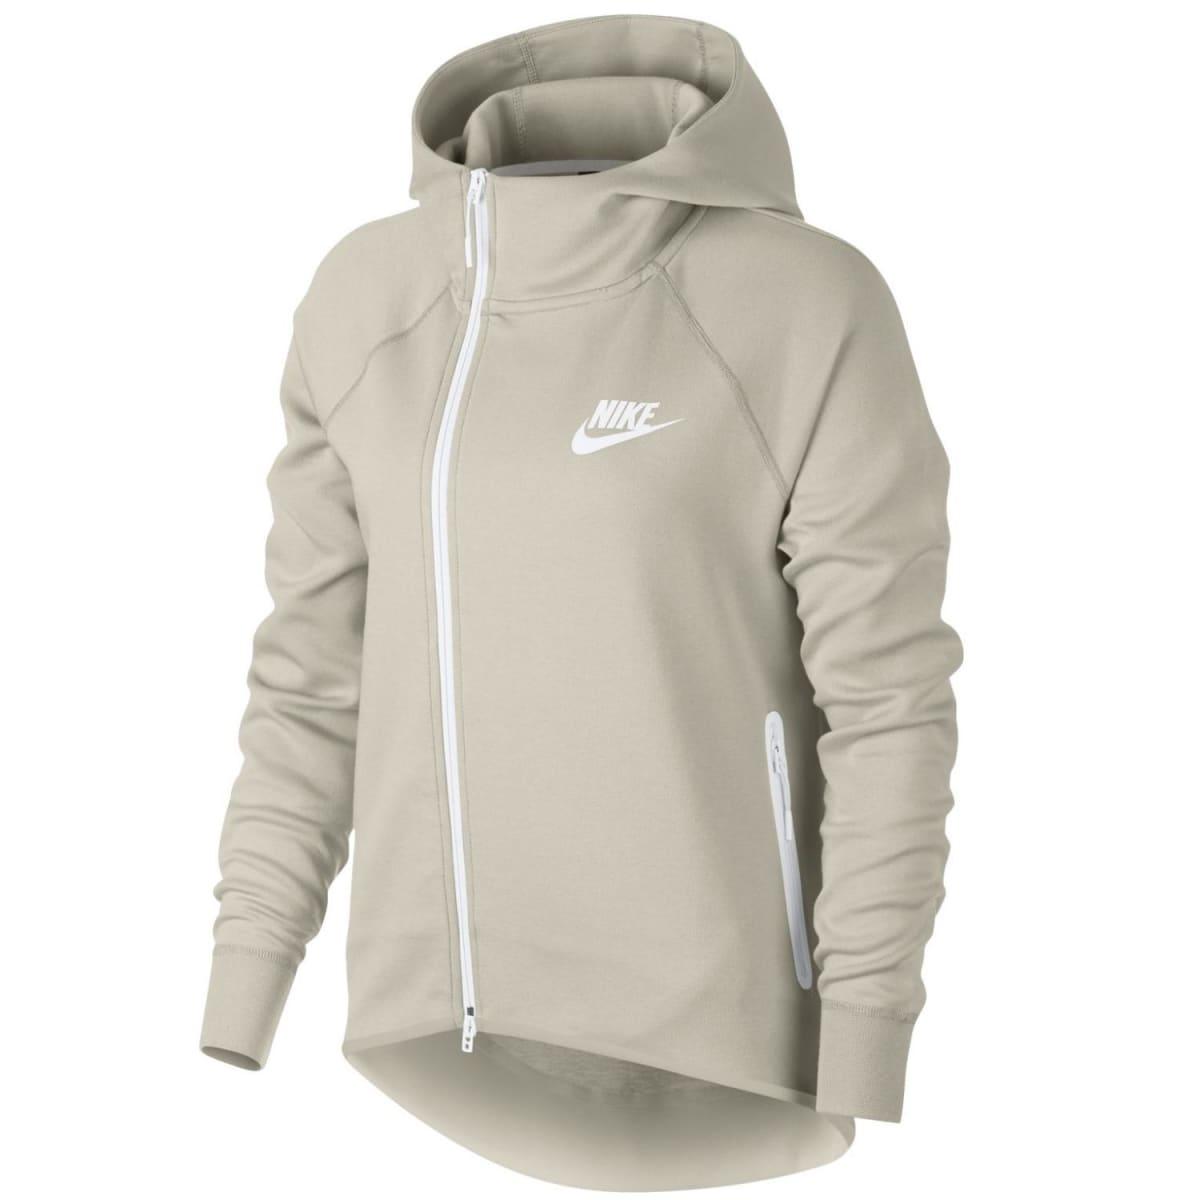 13a5d5e8 Product Image. Nike Women's Tech Fleece Cape